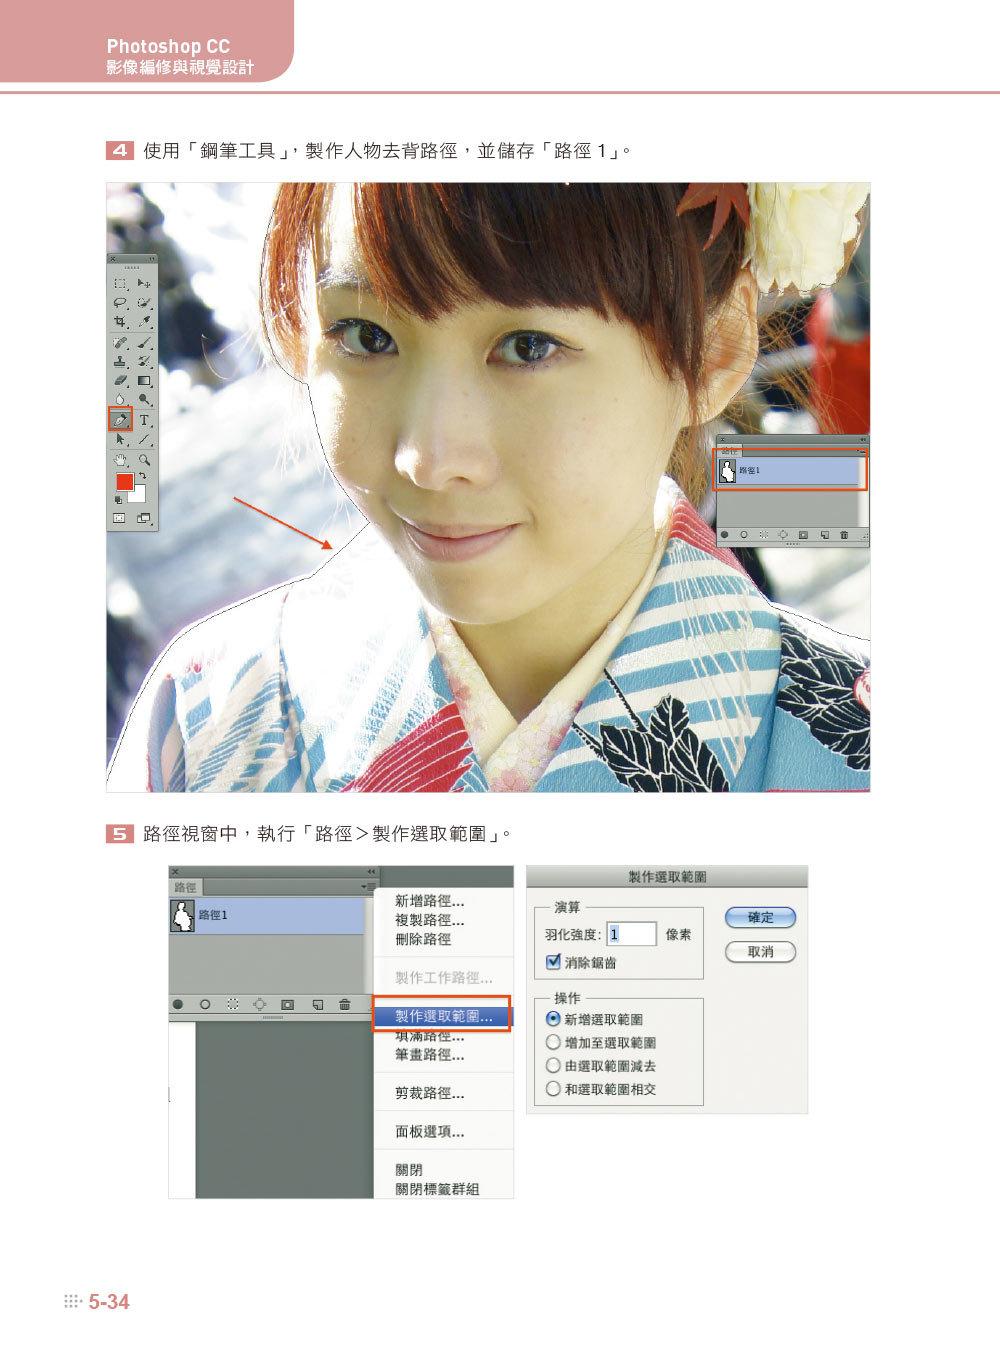 Photoshop CC 影像編修與視覺設計 (含ACA-Photoshop CC國際認證完全模擬與解題)-preview-3